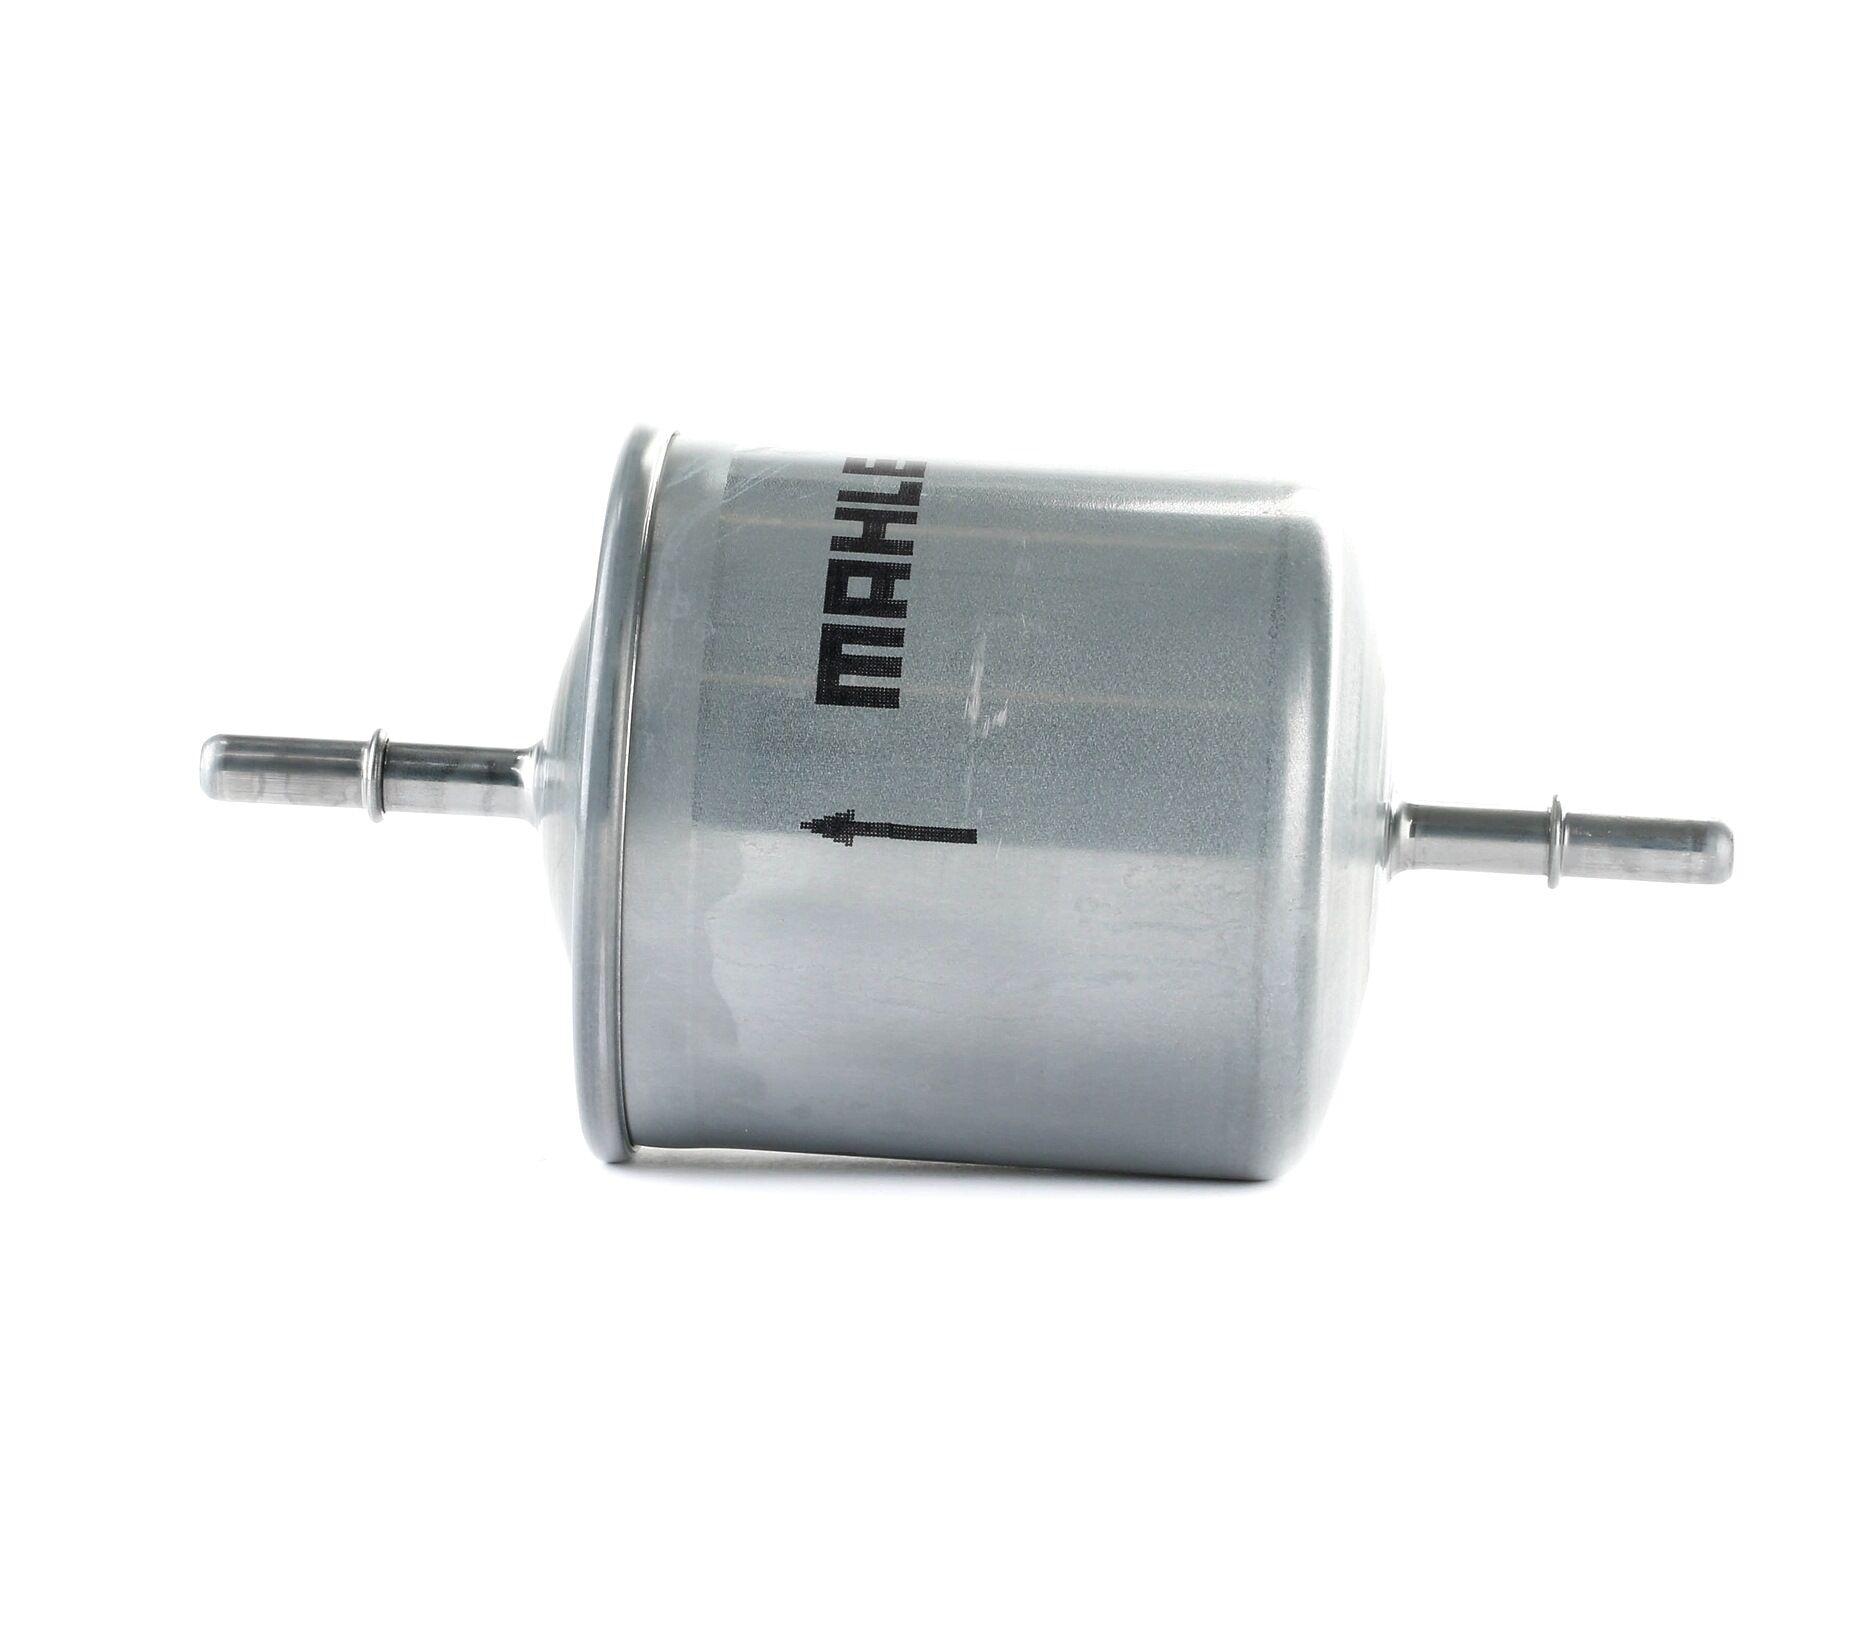 MAHLE ORIGINAL Filtre à Carburant VOLVO KL 257 30636704,306367040 Filtre Fuel